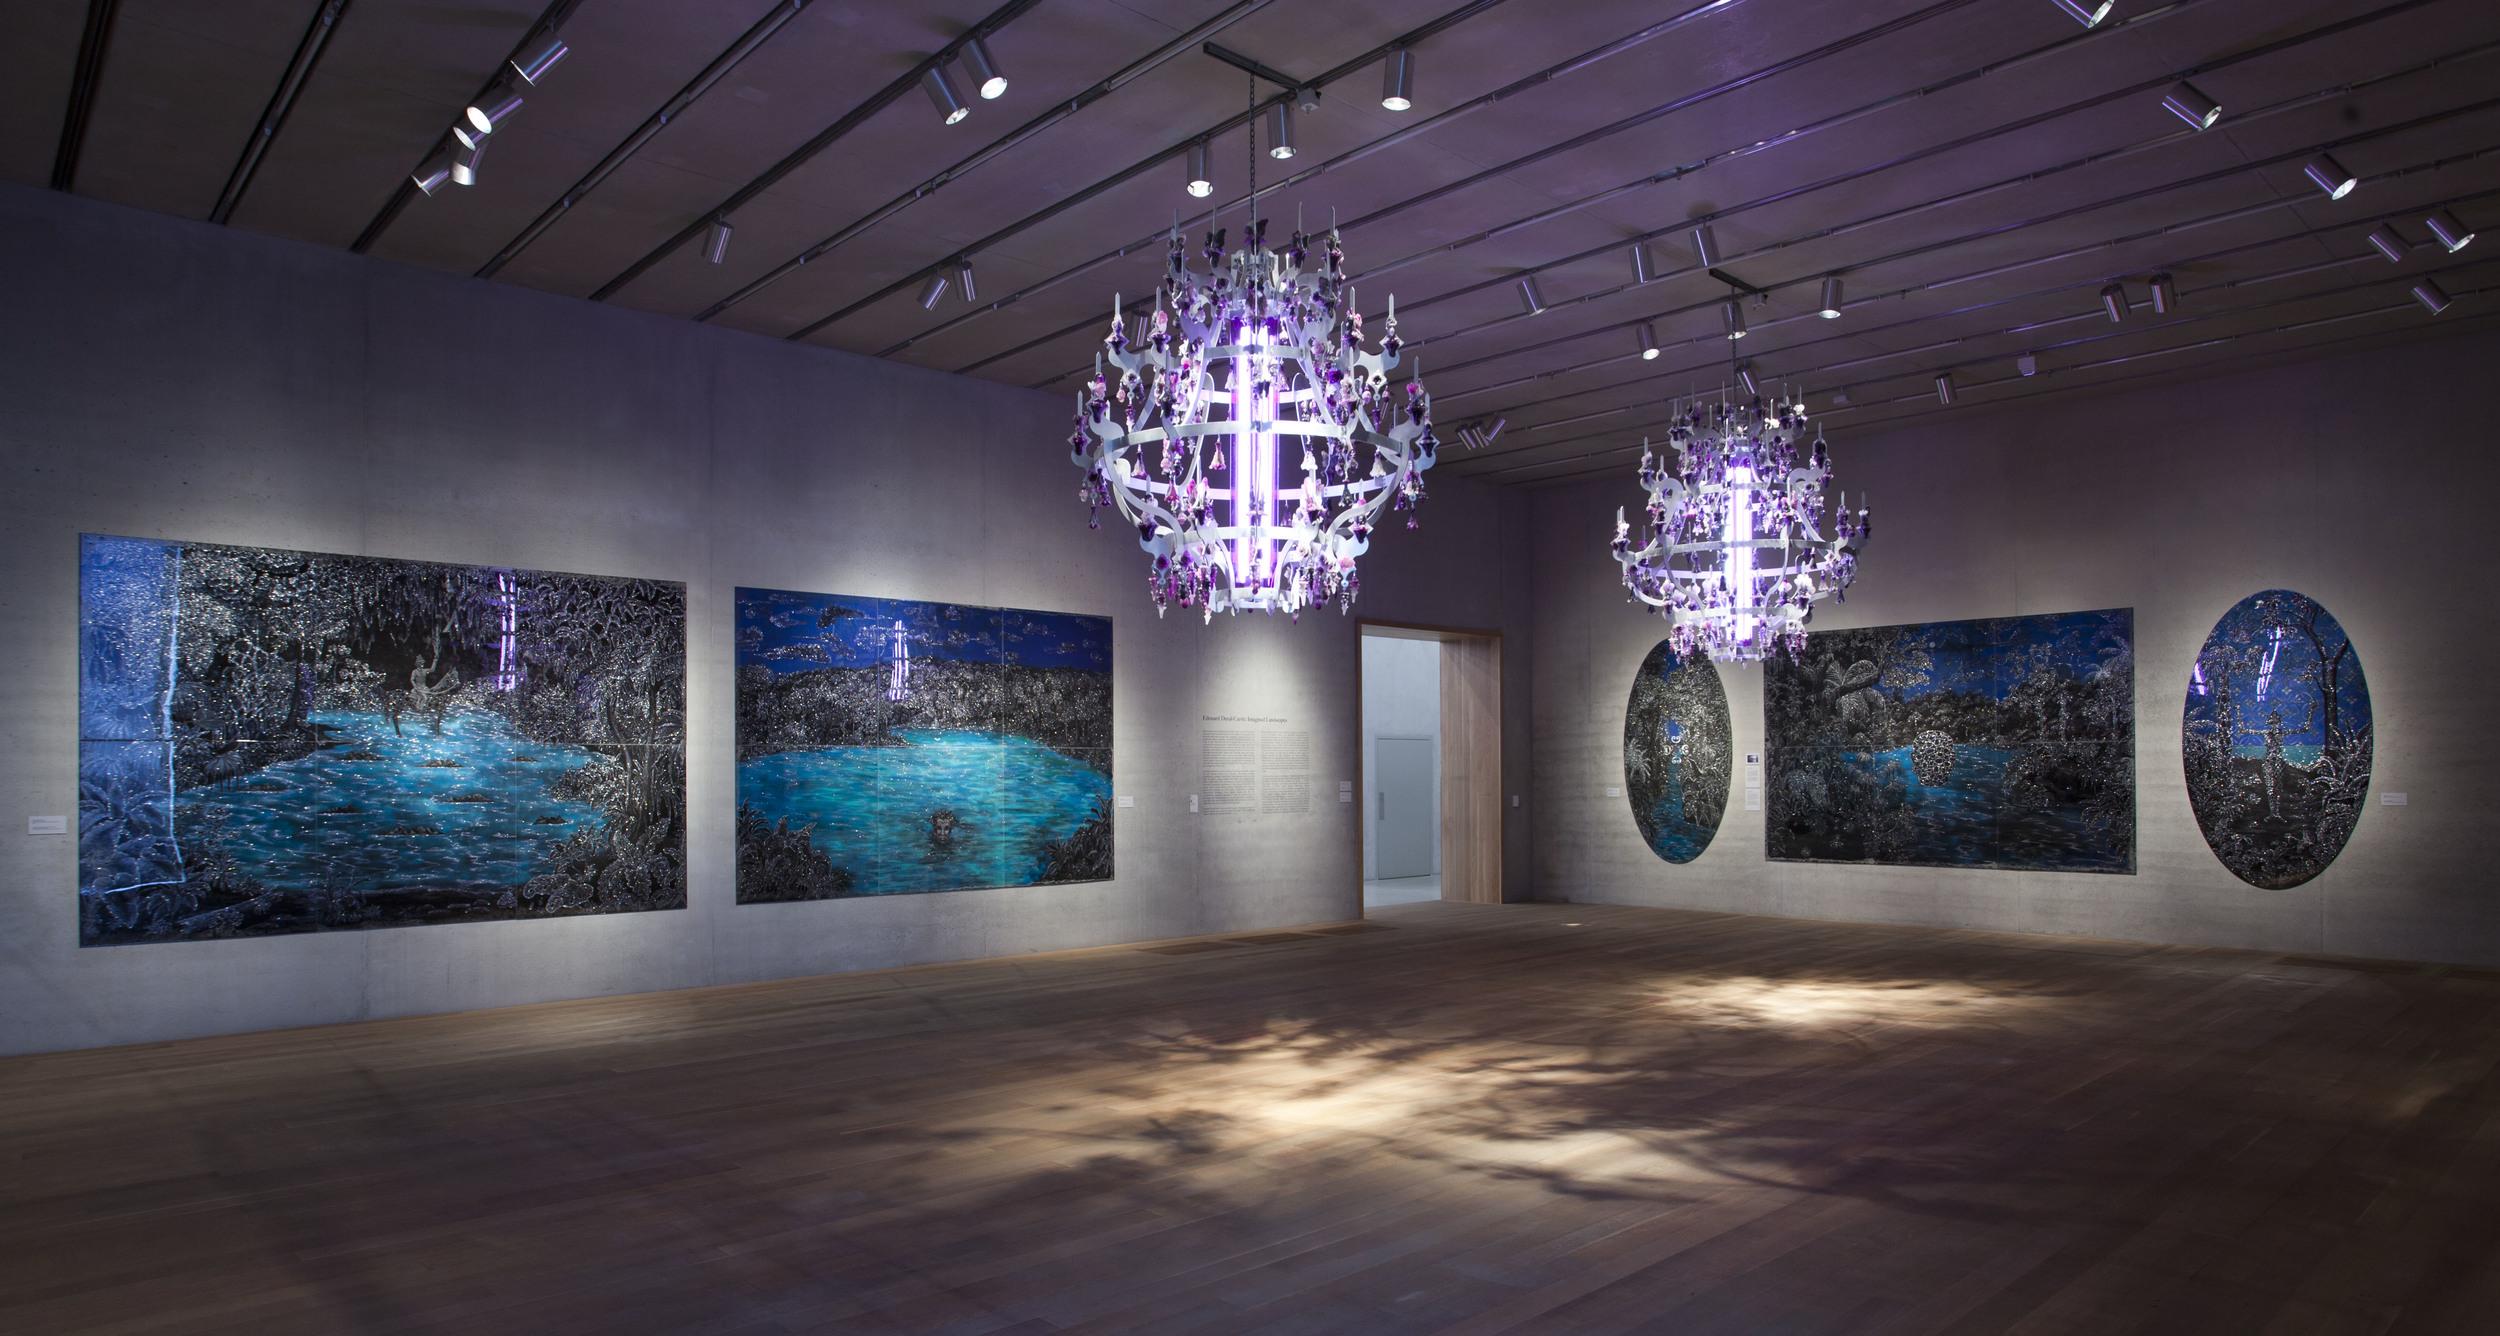 Installation view, Imagined Landscapes, Perez Art Museum Miami, 2014